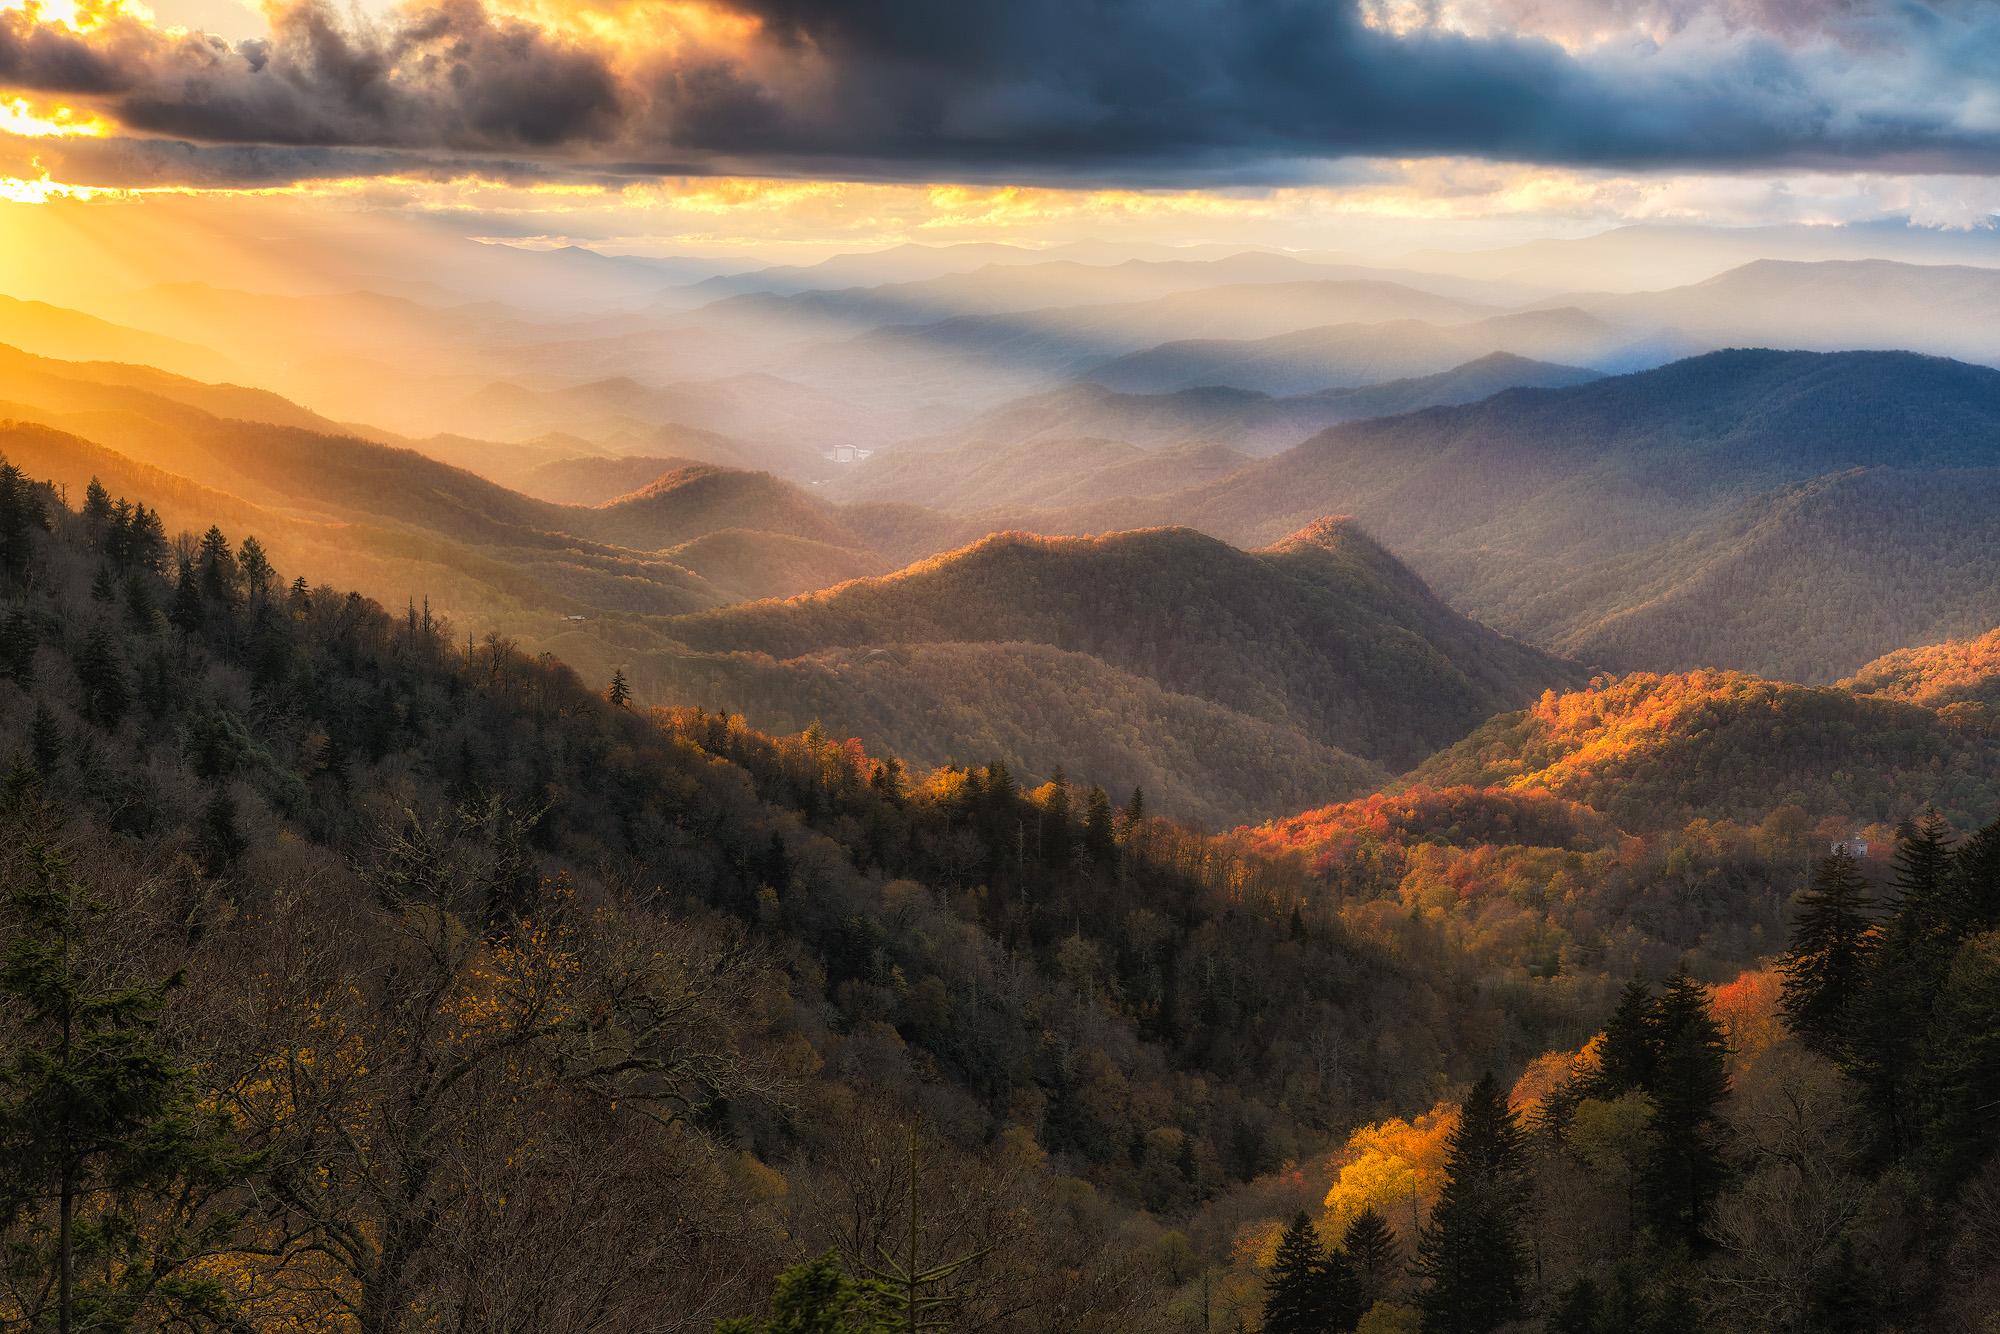 Fall-Wollyback-overlook.jpg